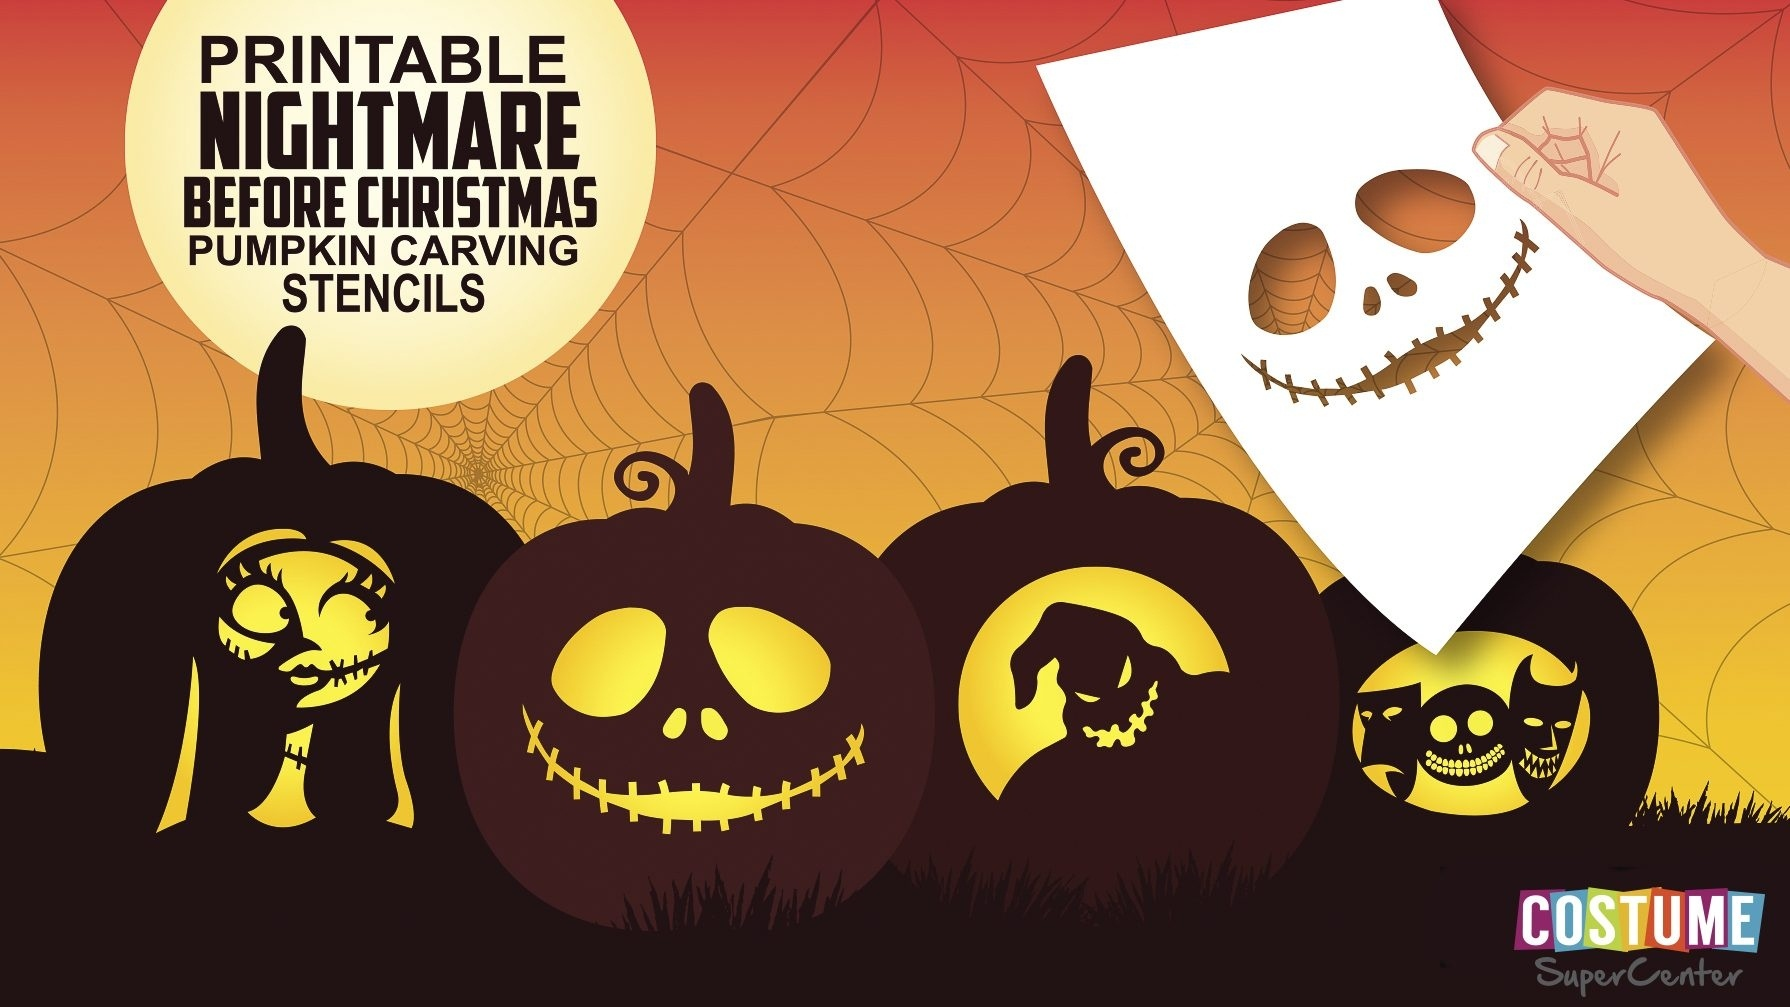 Free Printable Nightmare Before Christmas Pumpkin Carving Stencils - Free Printable Nightmare Before Christmas Pumpkin Stencils